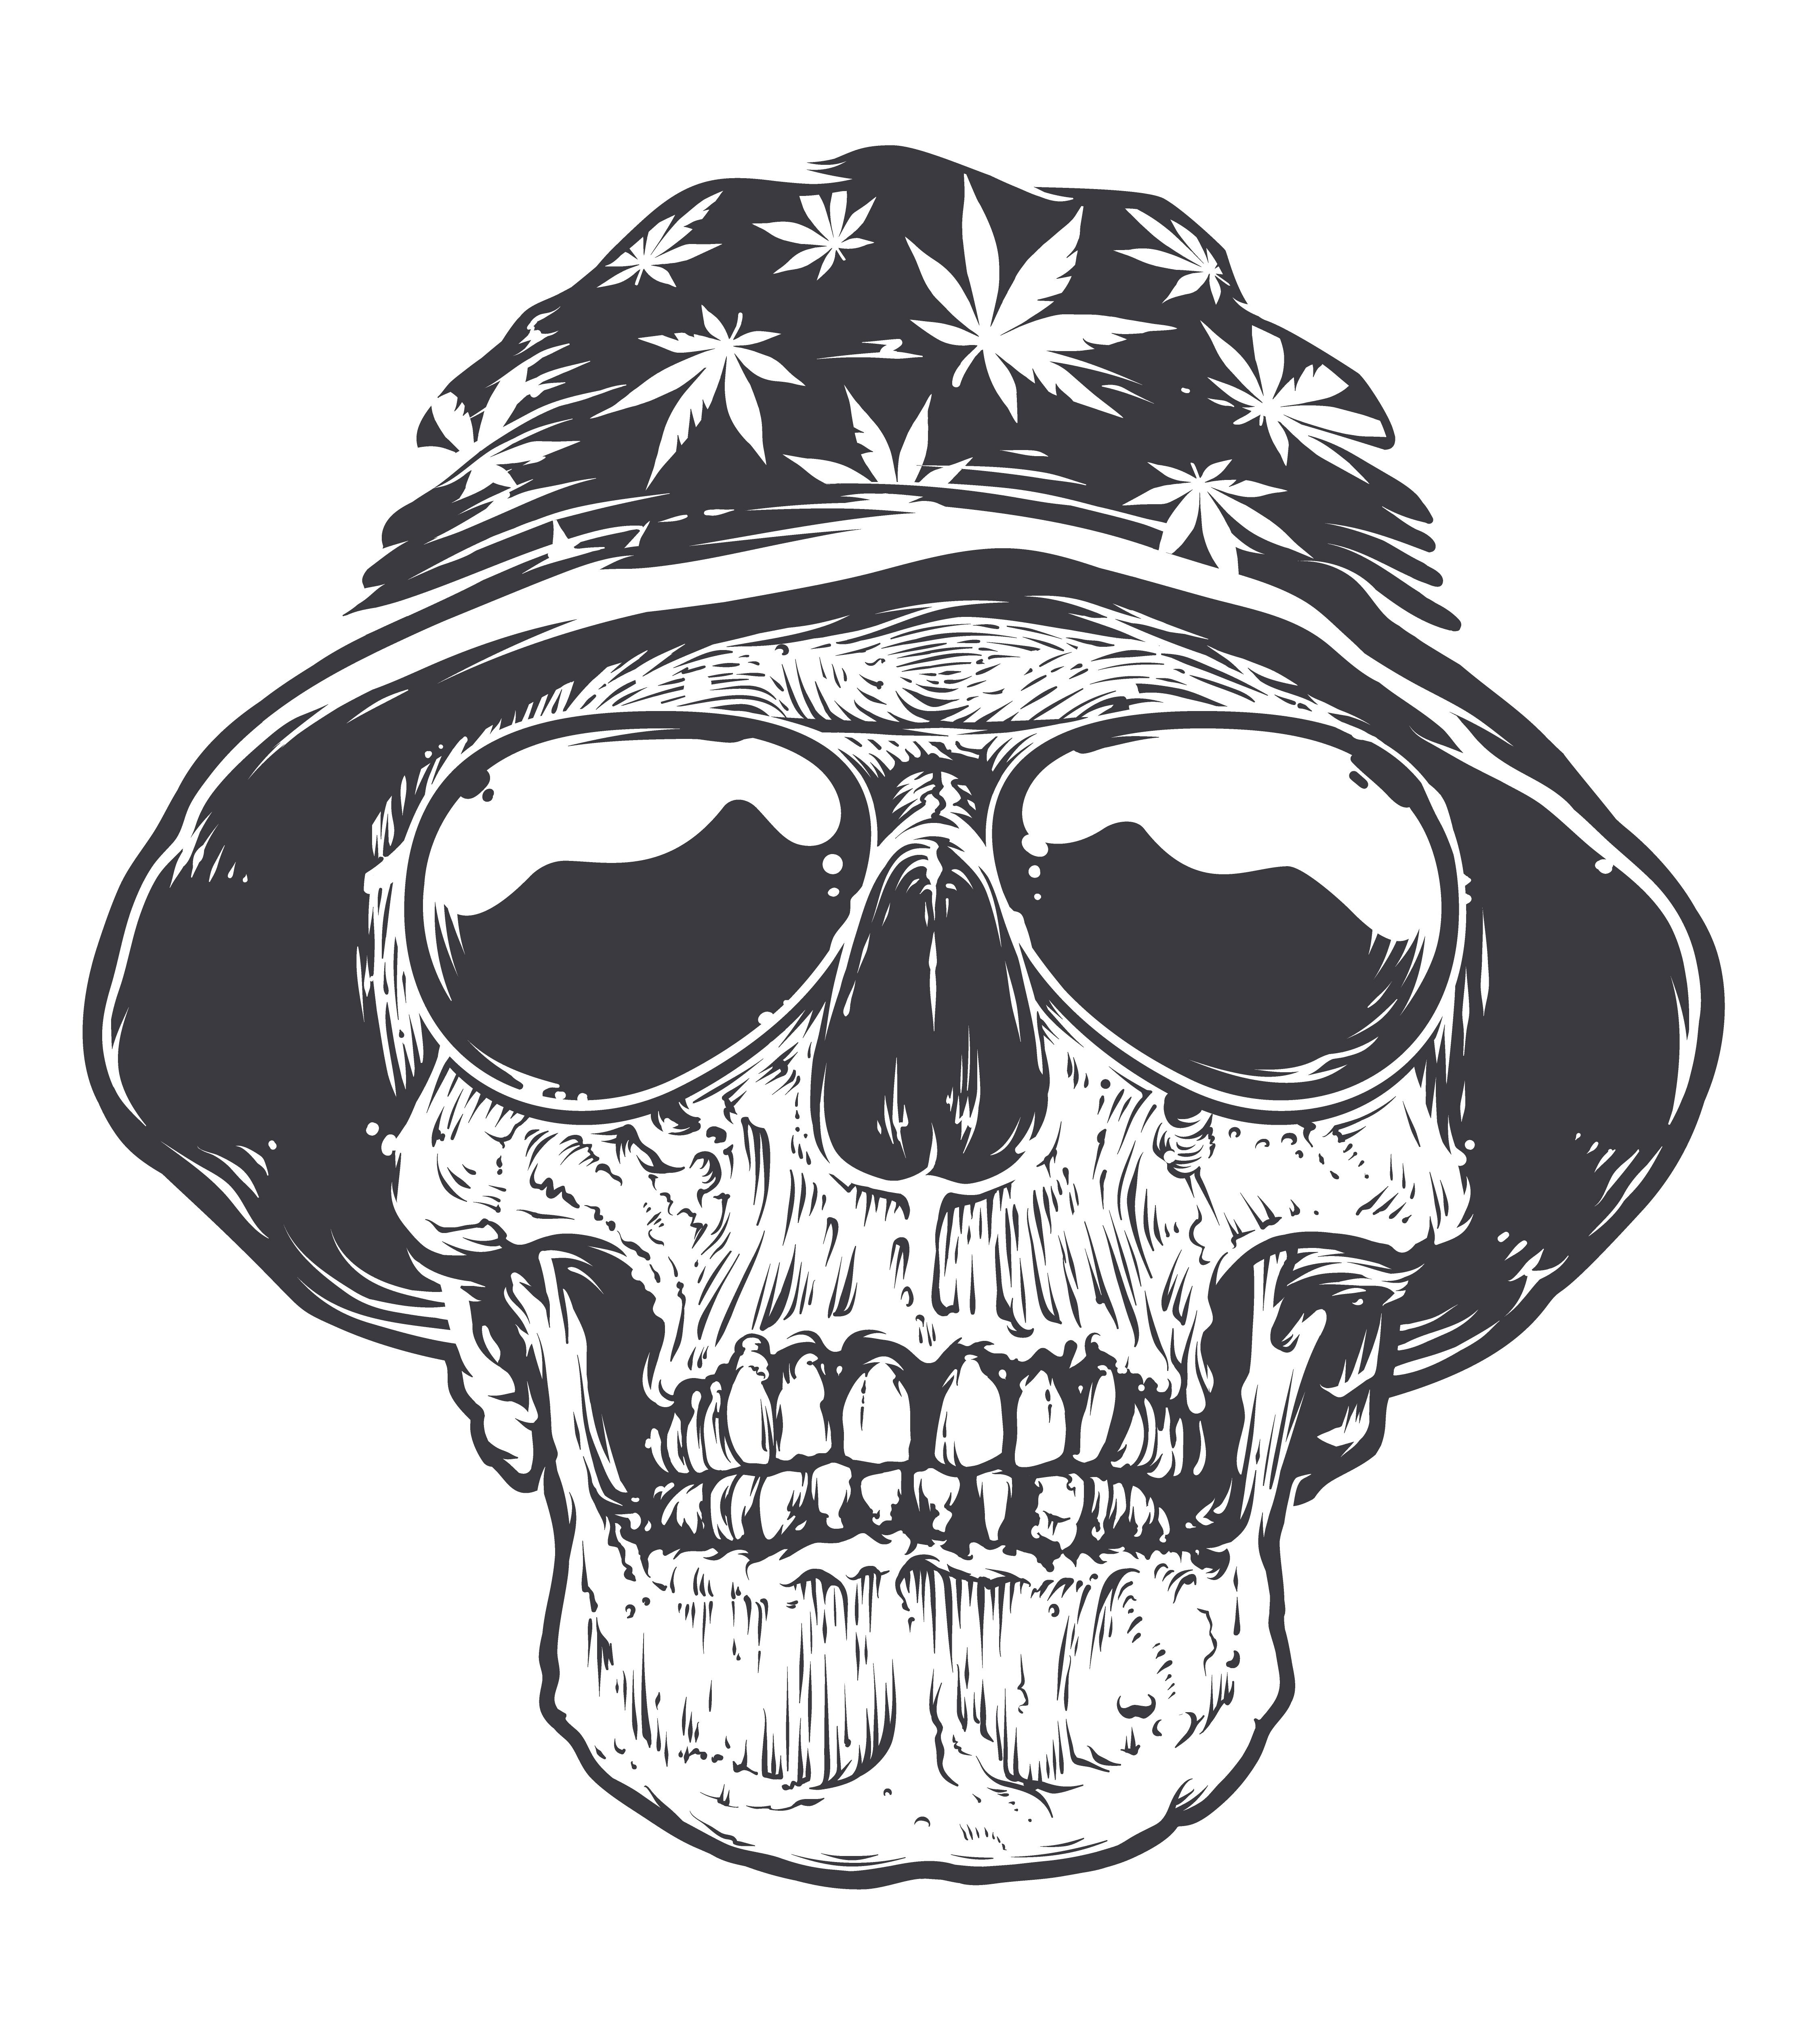 rasta skull in hat and sunglasses download free vector